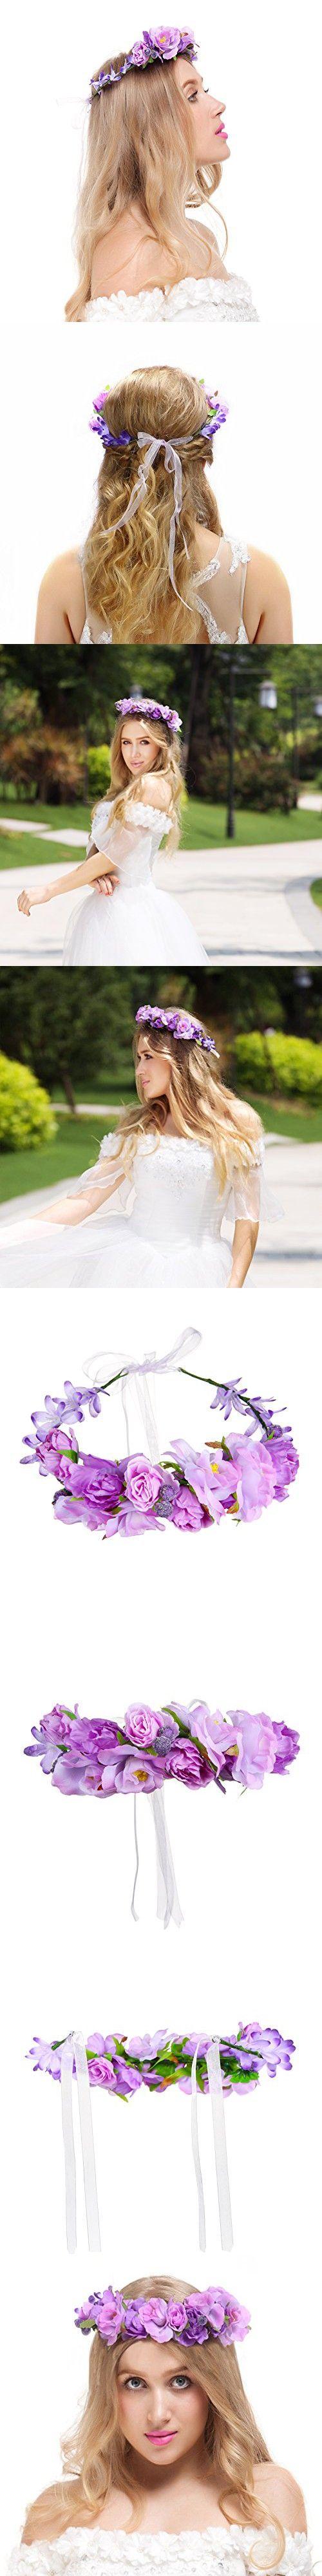 Valdler Exquisite Camellia Berries Flower Crown with Adjustable Ribbon for Wedding Festivals Purple